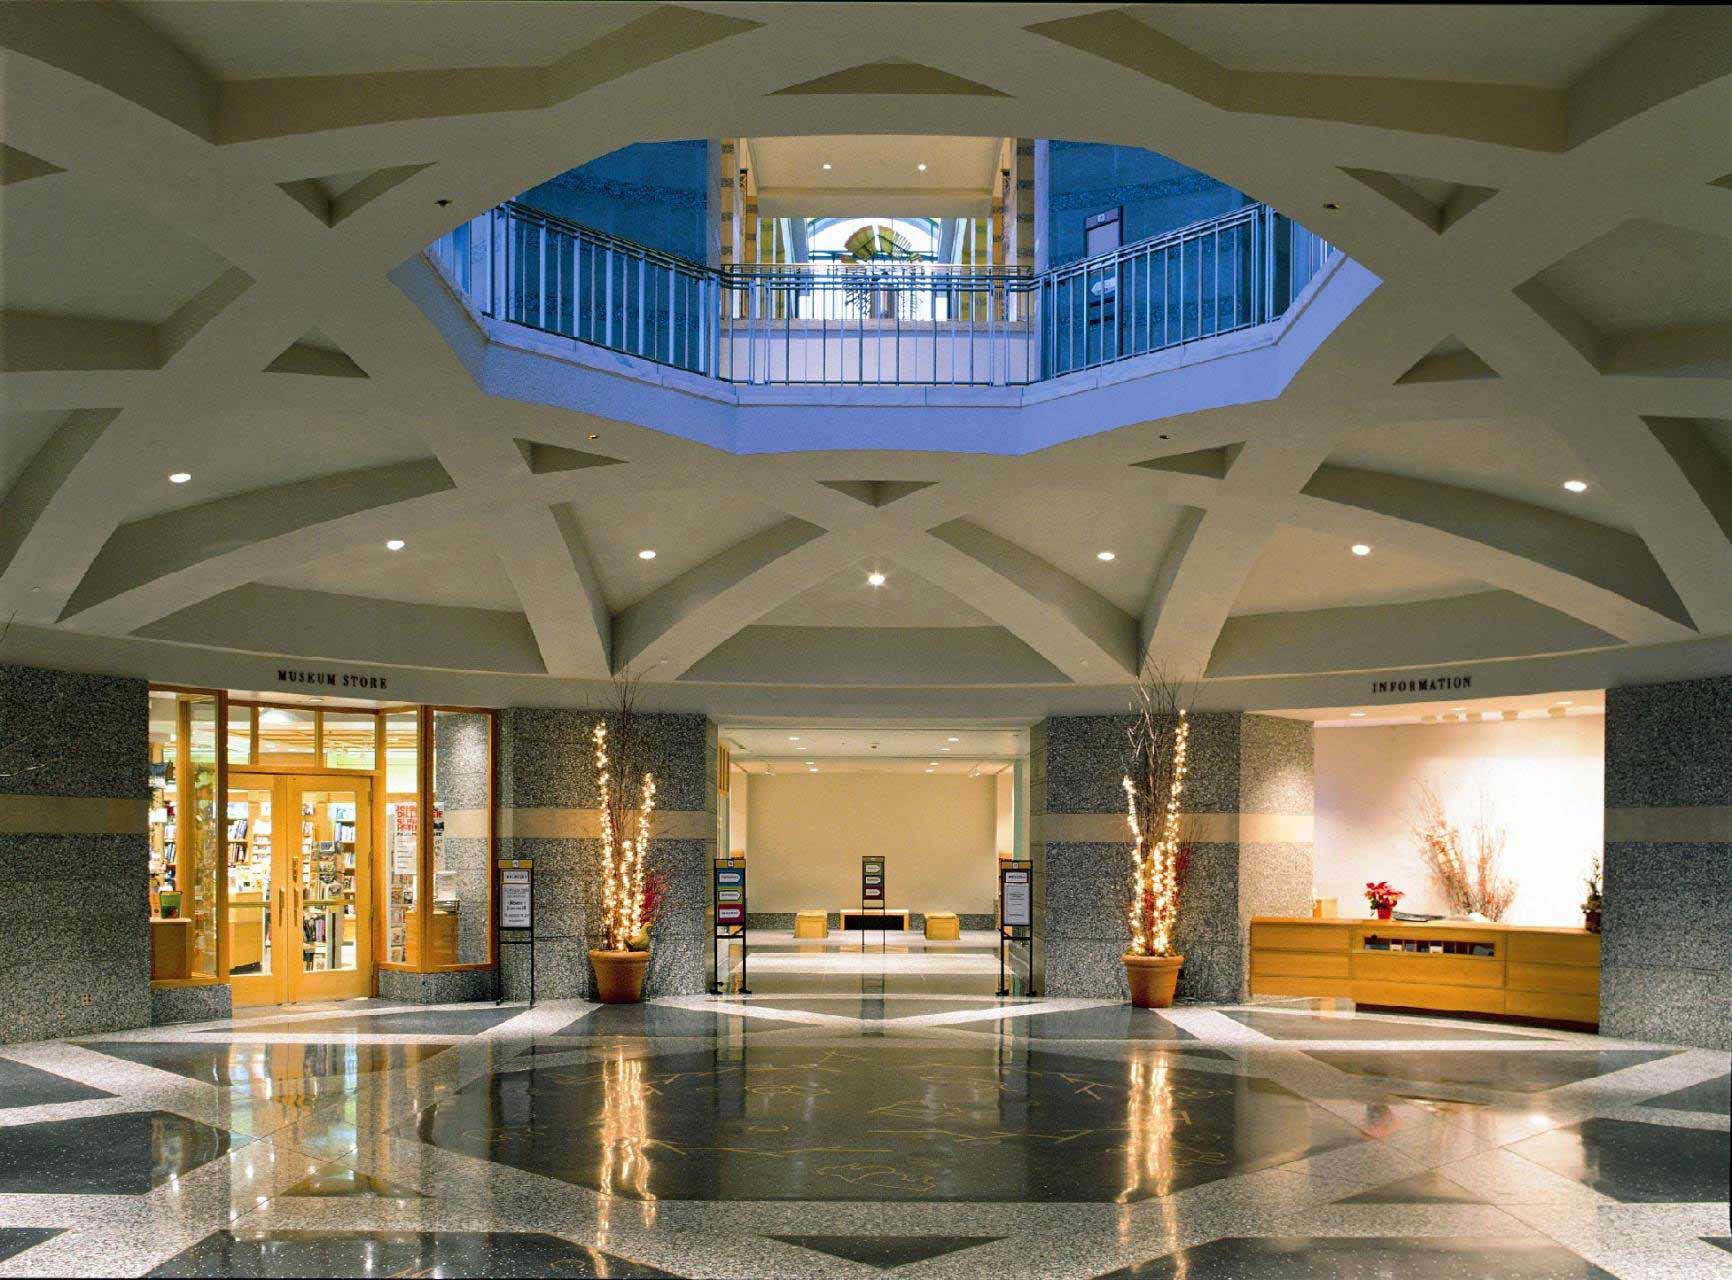 Minnesota History Center lobby